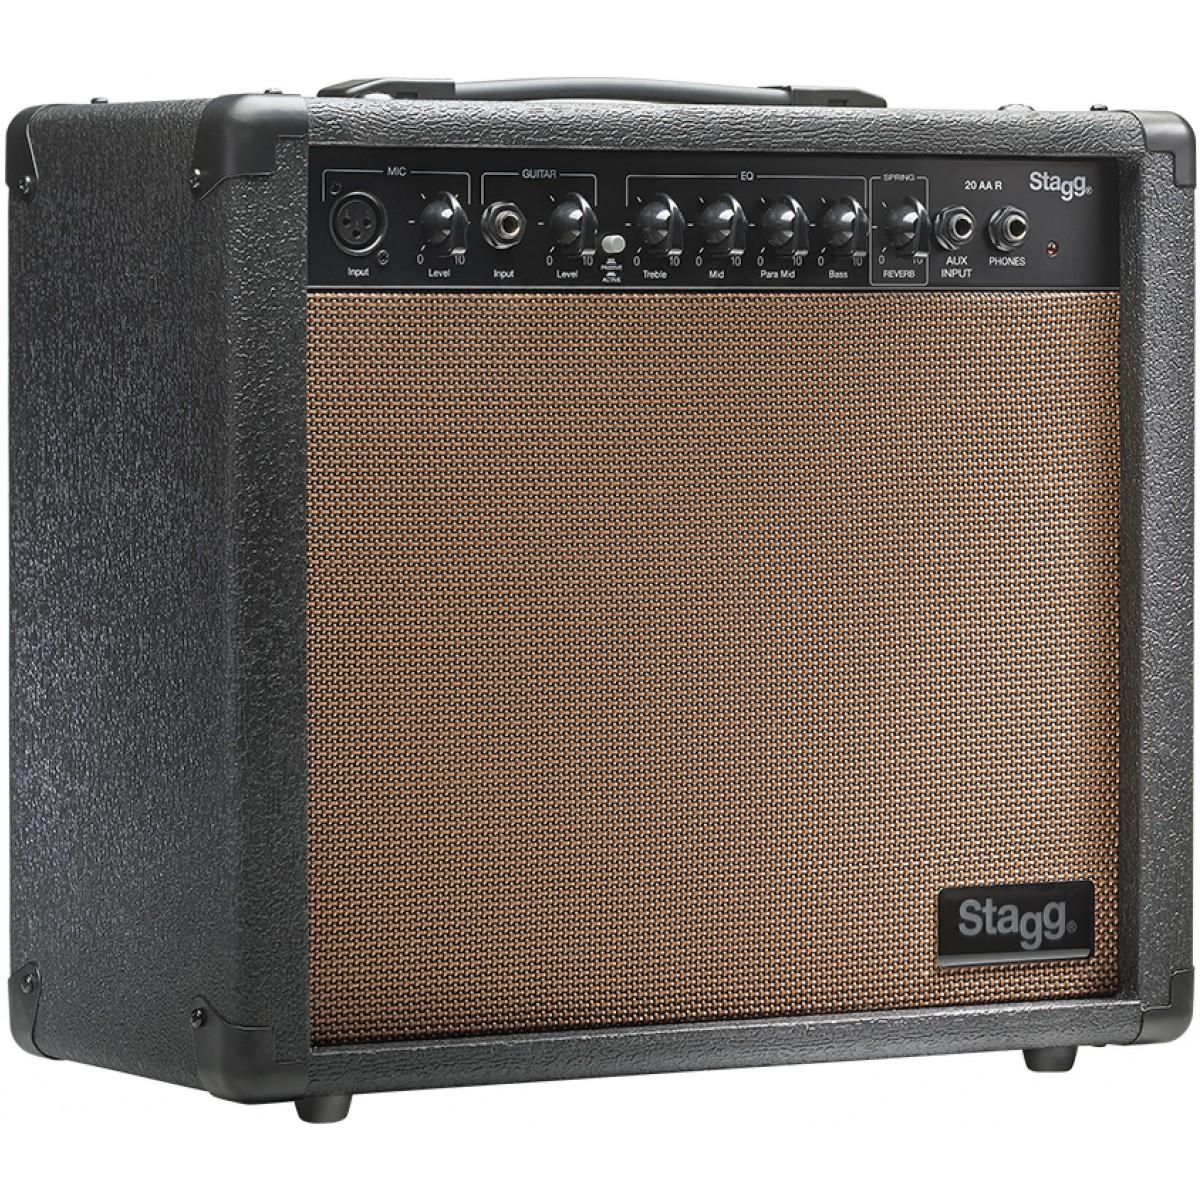 Stagg 20 AA R, kombo pro el. akustickou kytaru, 20W